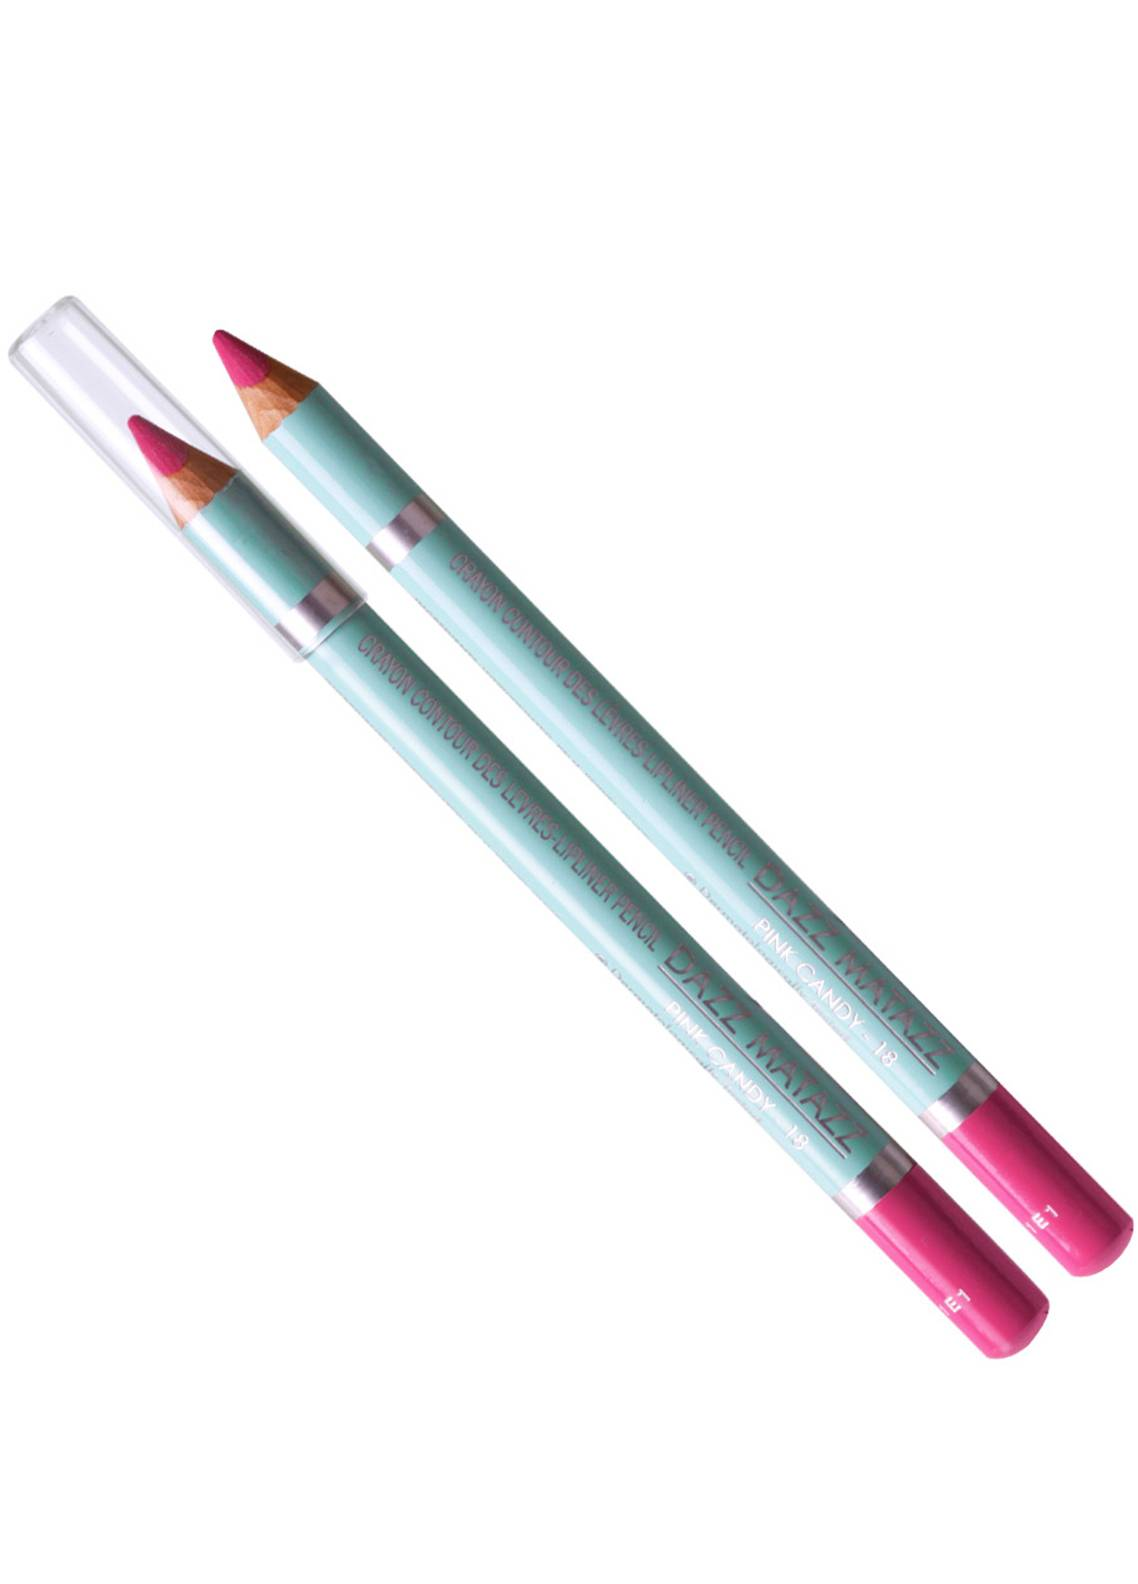 Dazz Matazz Lip Liner Pencil-18 PINK CANDY